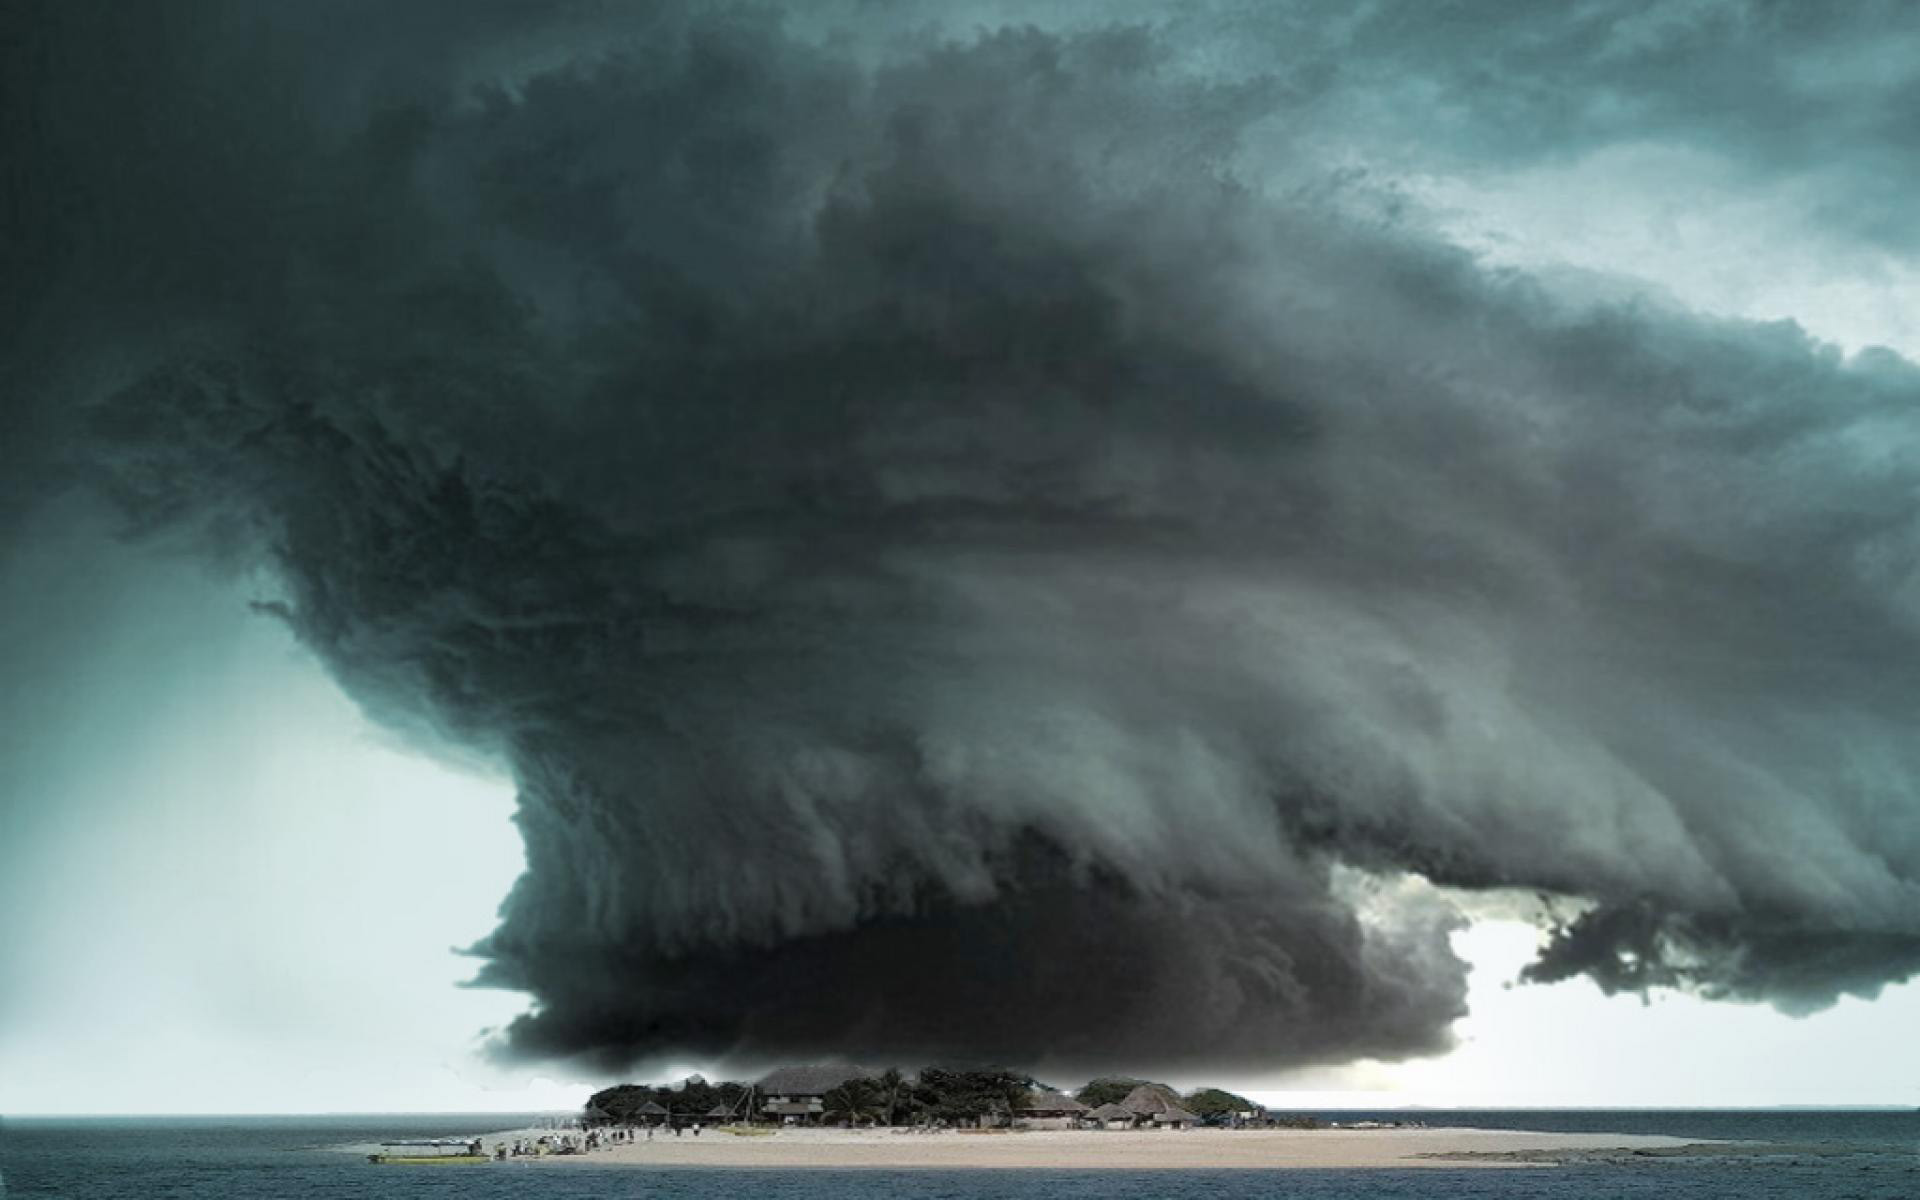 tempestad negra: